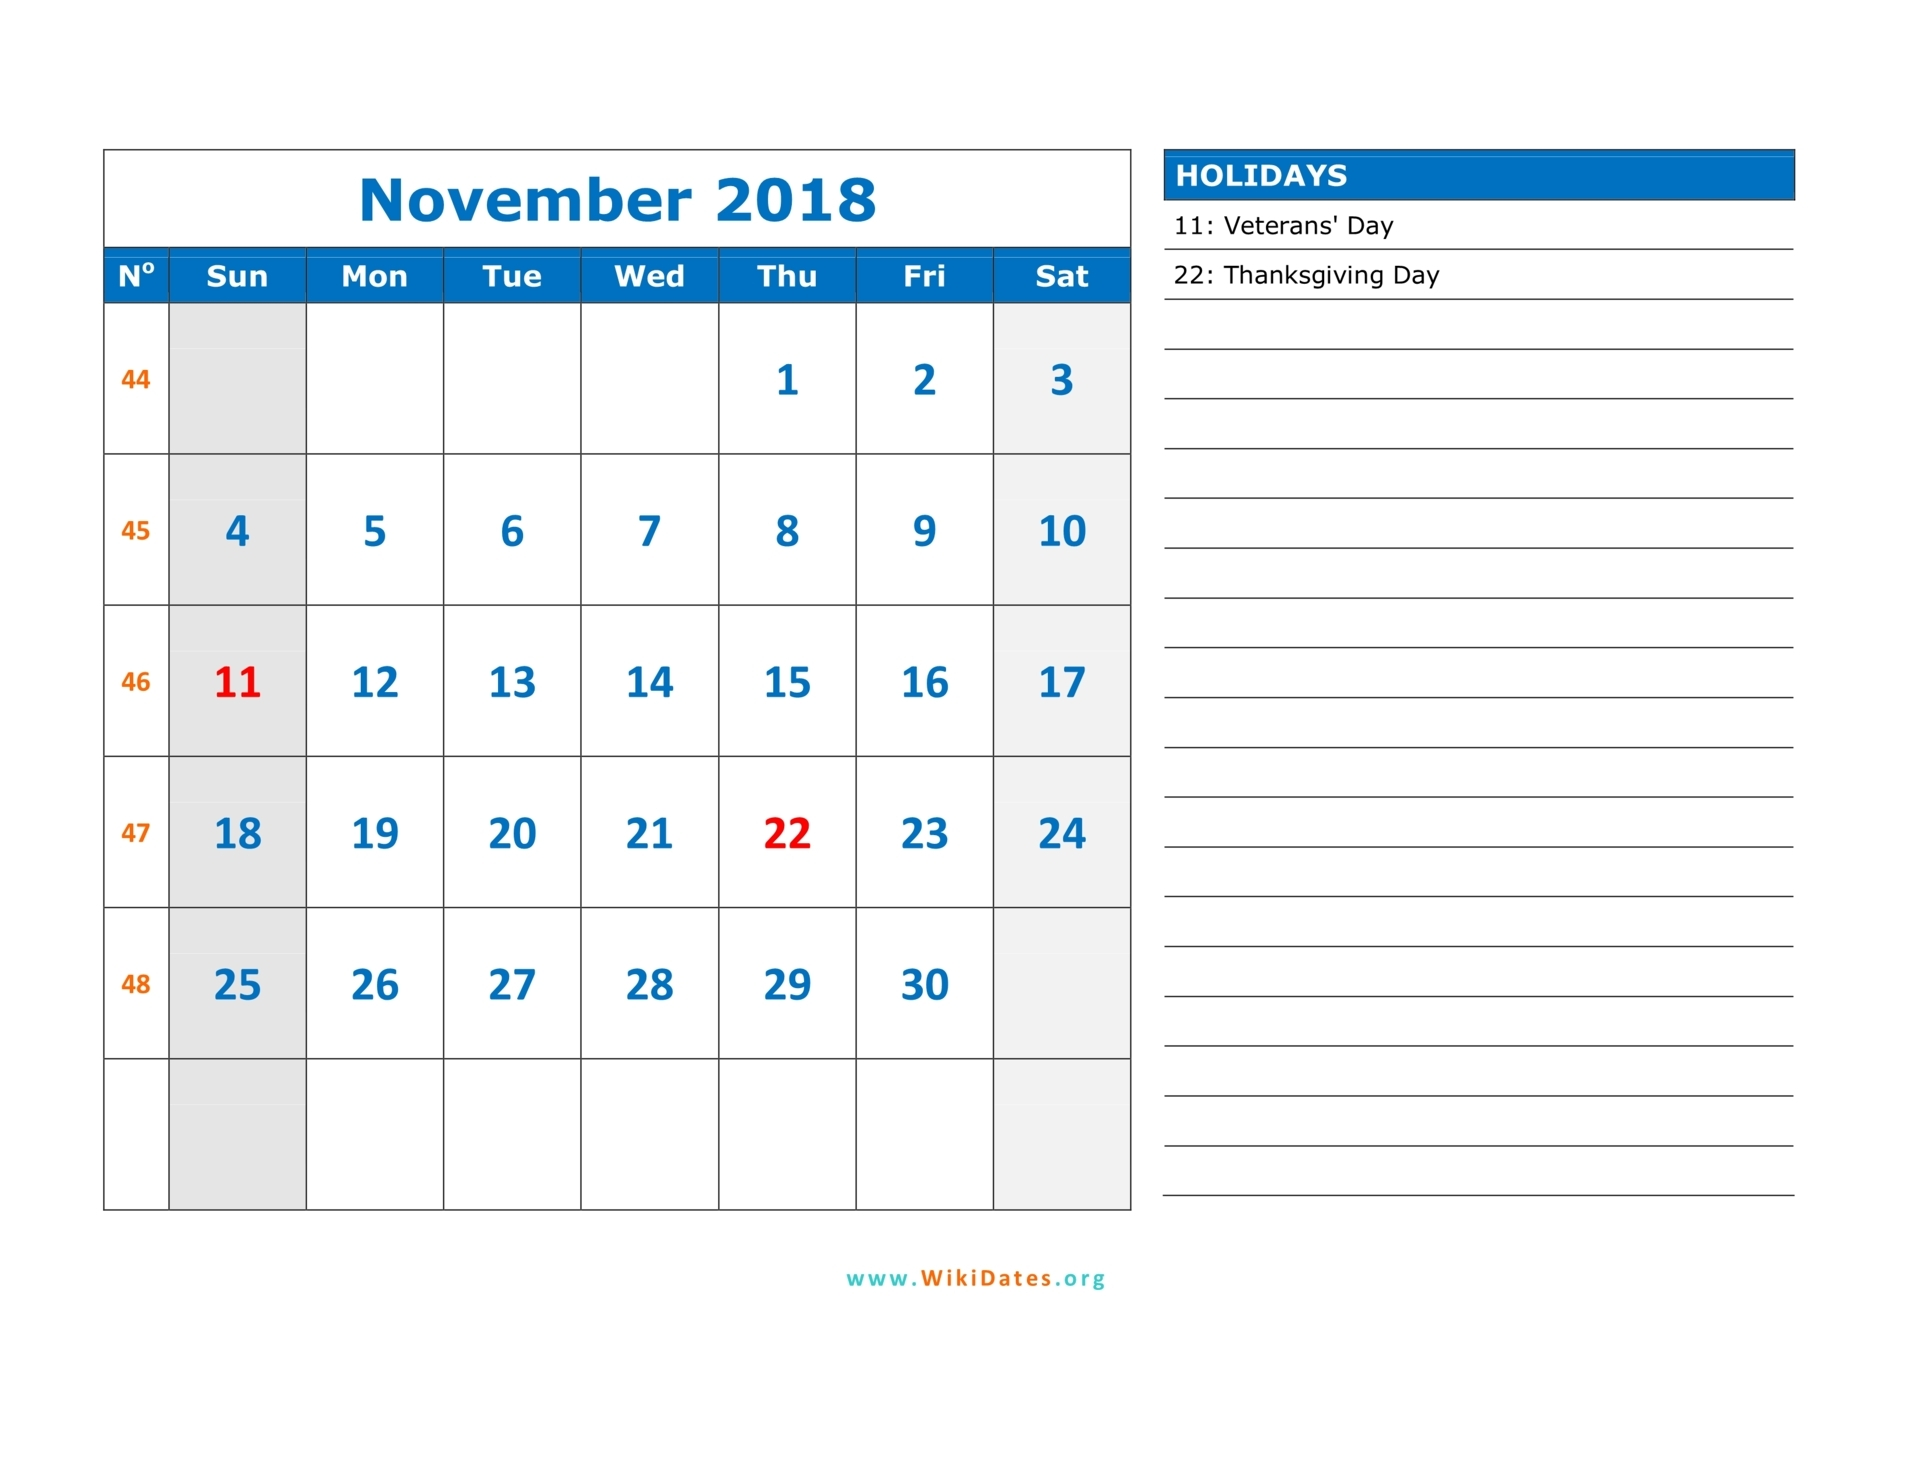 November 2018 Calendar | WikiDates.org